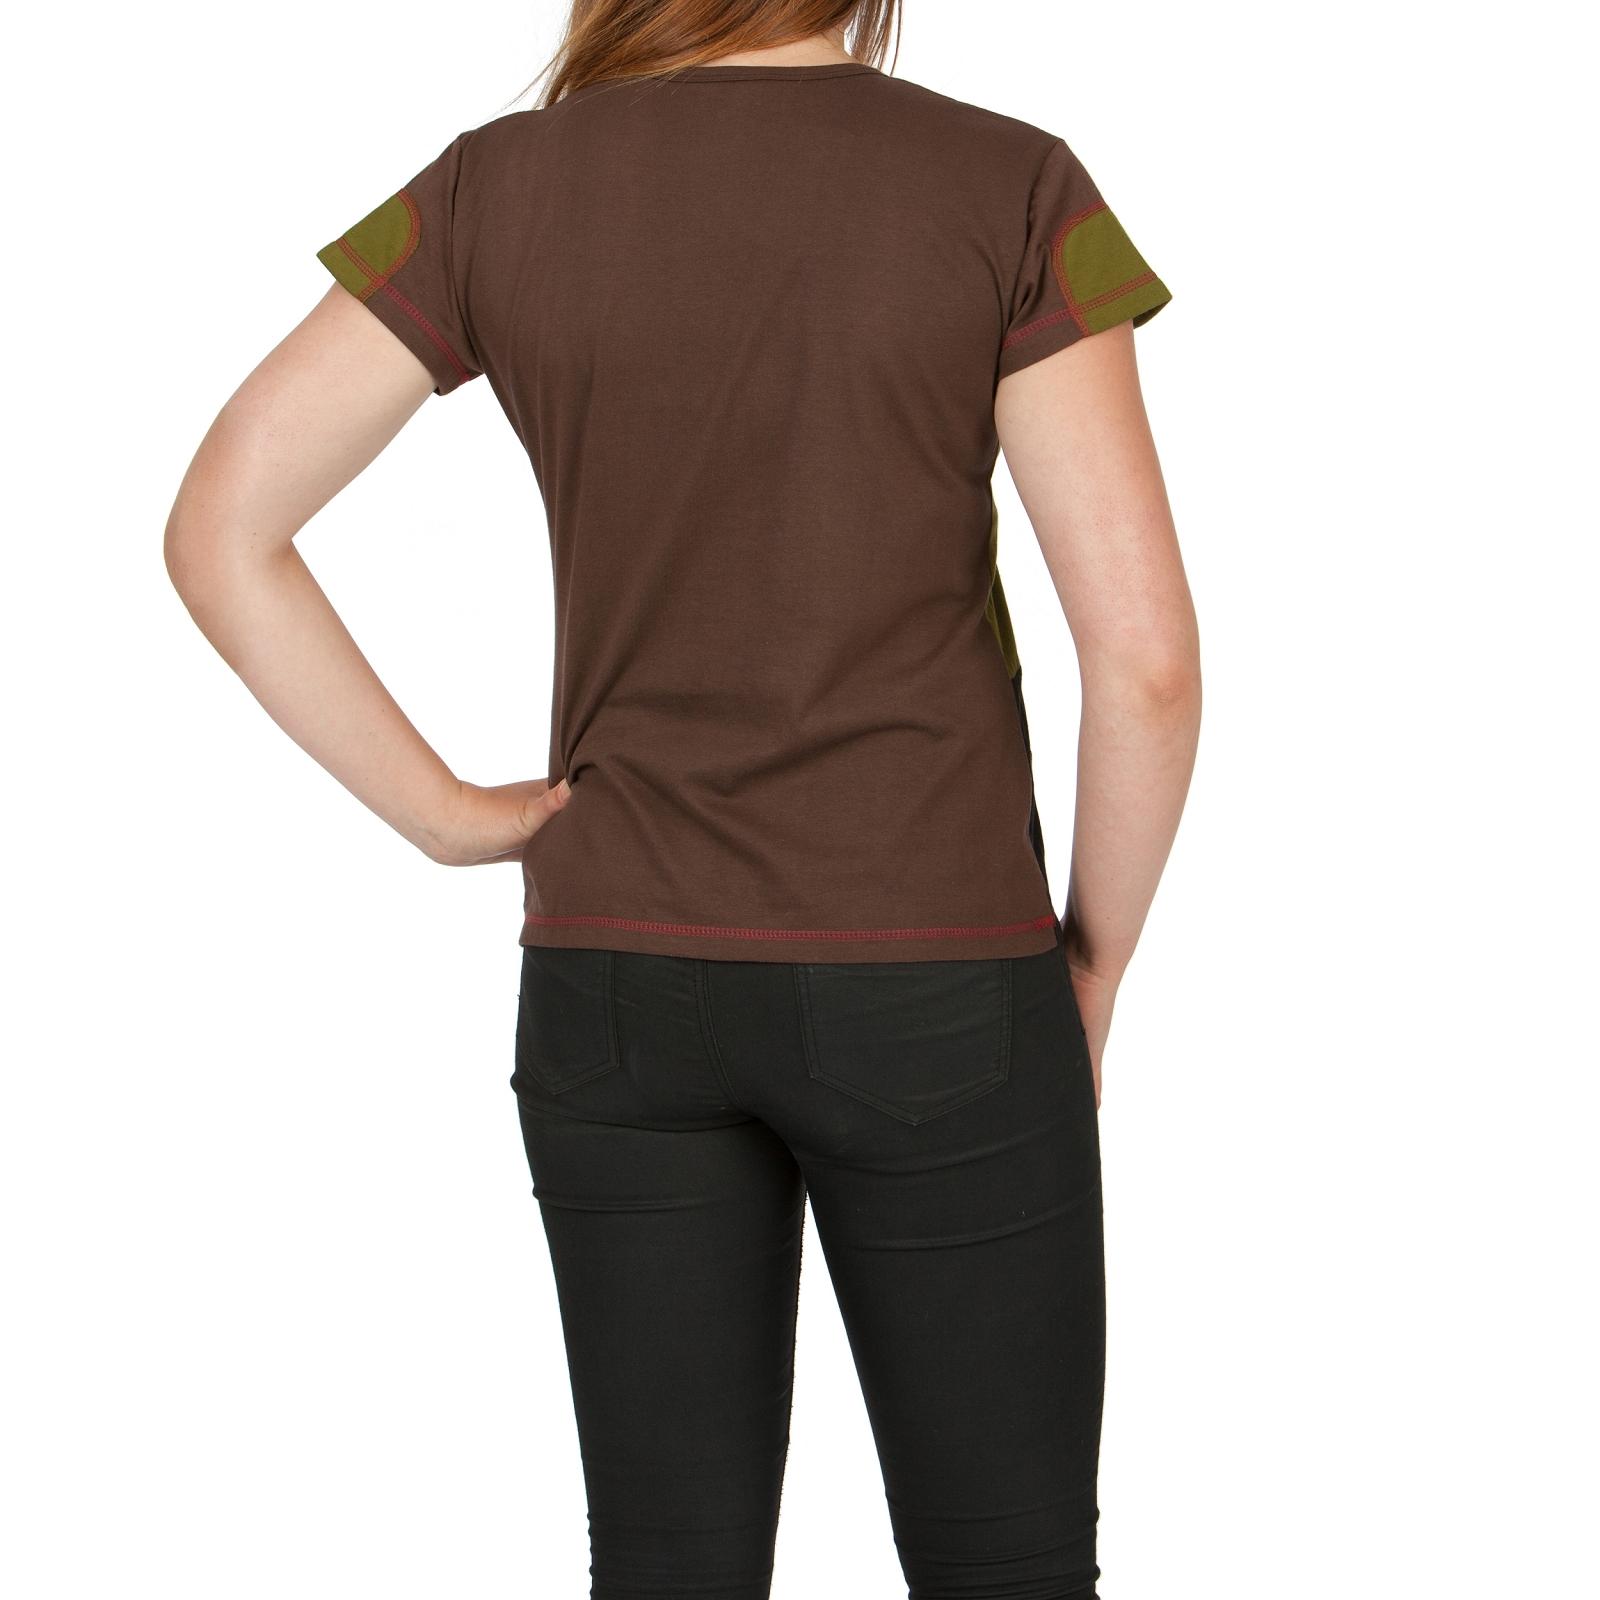 shirt top damenshirt ethno t shirt kurzarm oberteil hippie sommer baumwolle s xl ebay. Black Bedroom Furniture Sets. Home Design Ideas